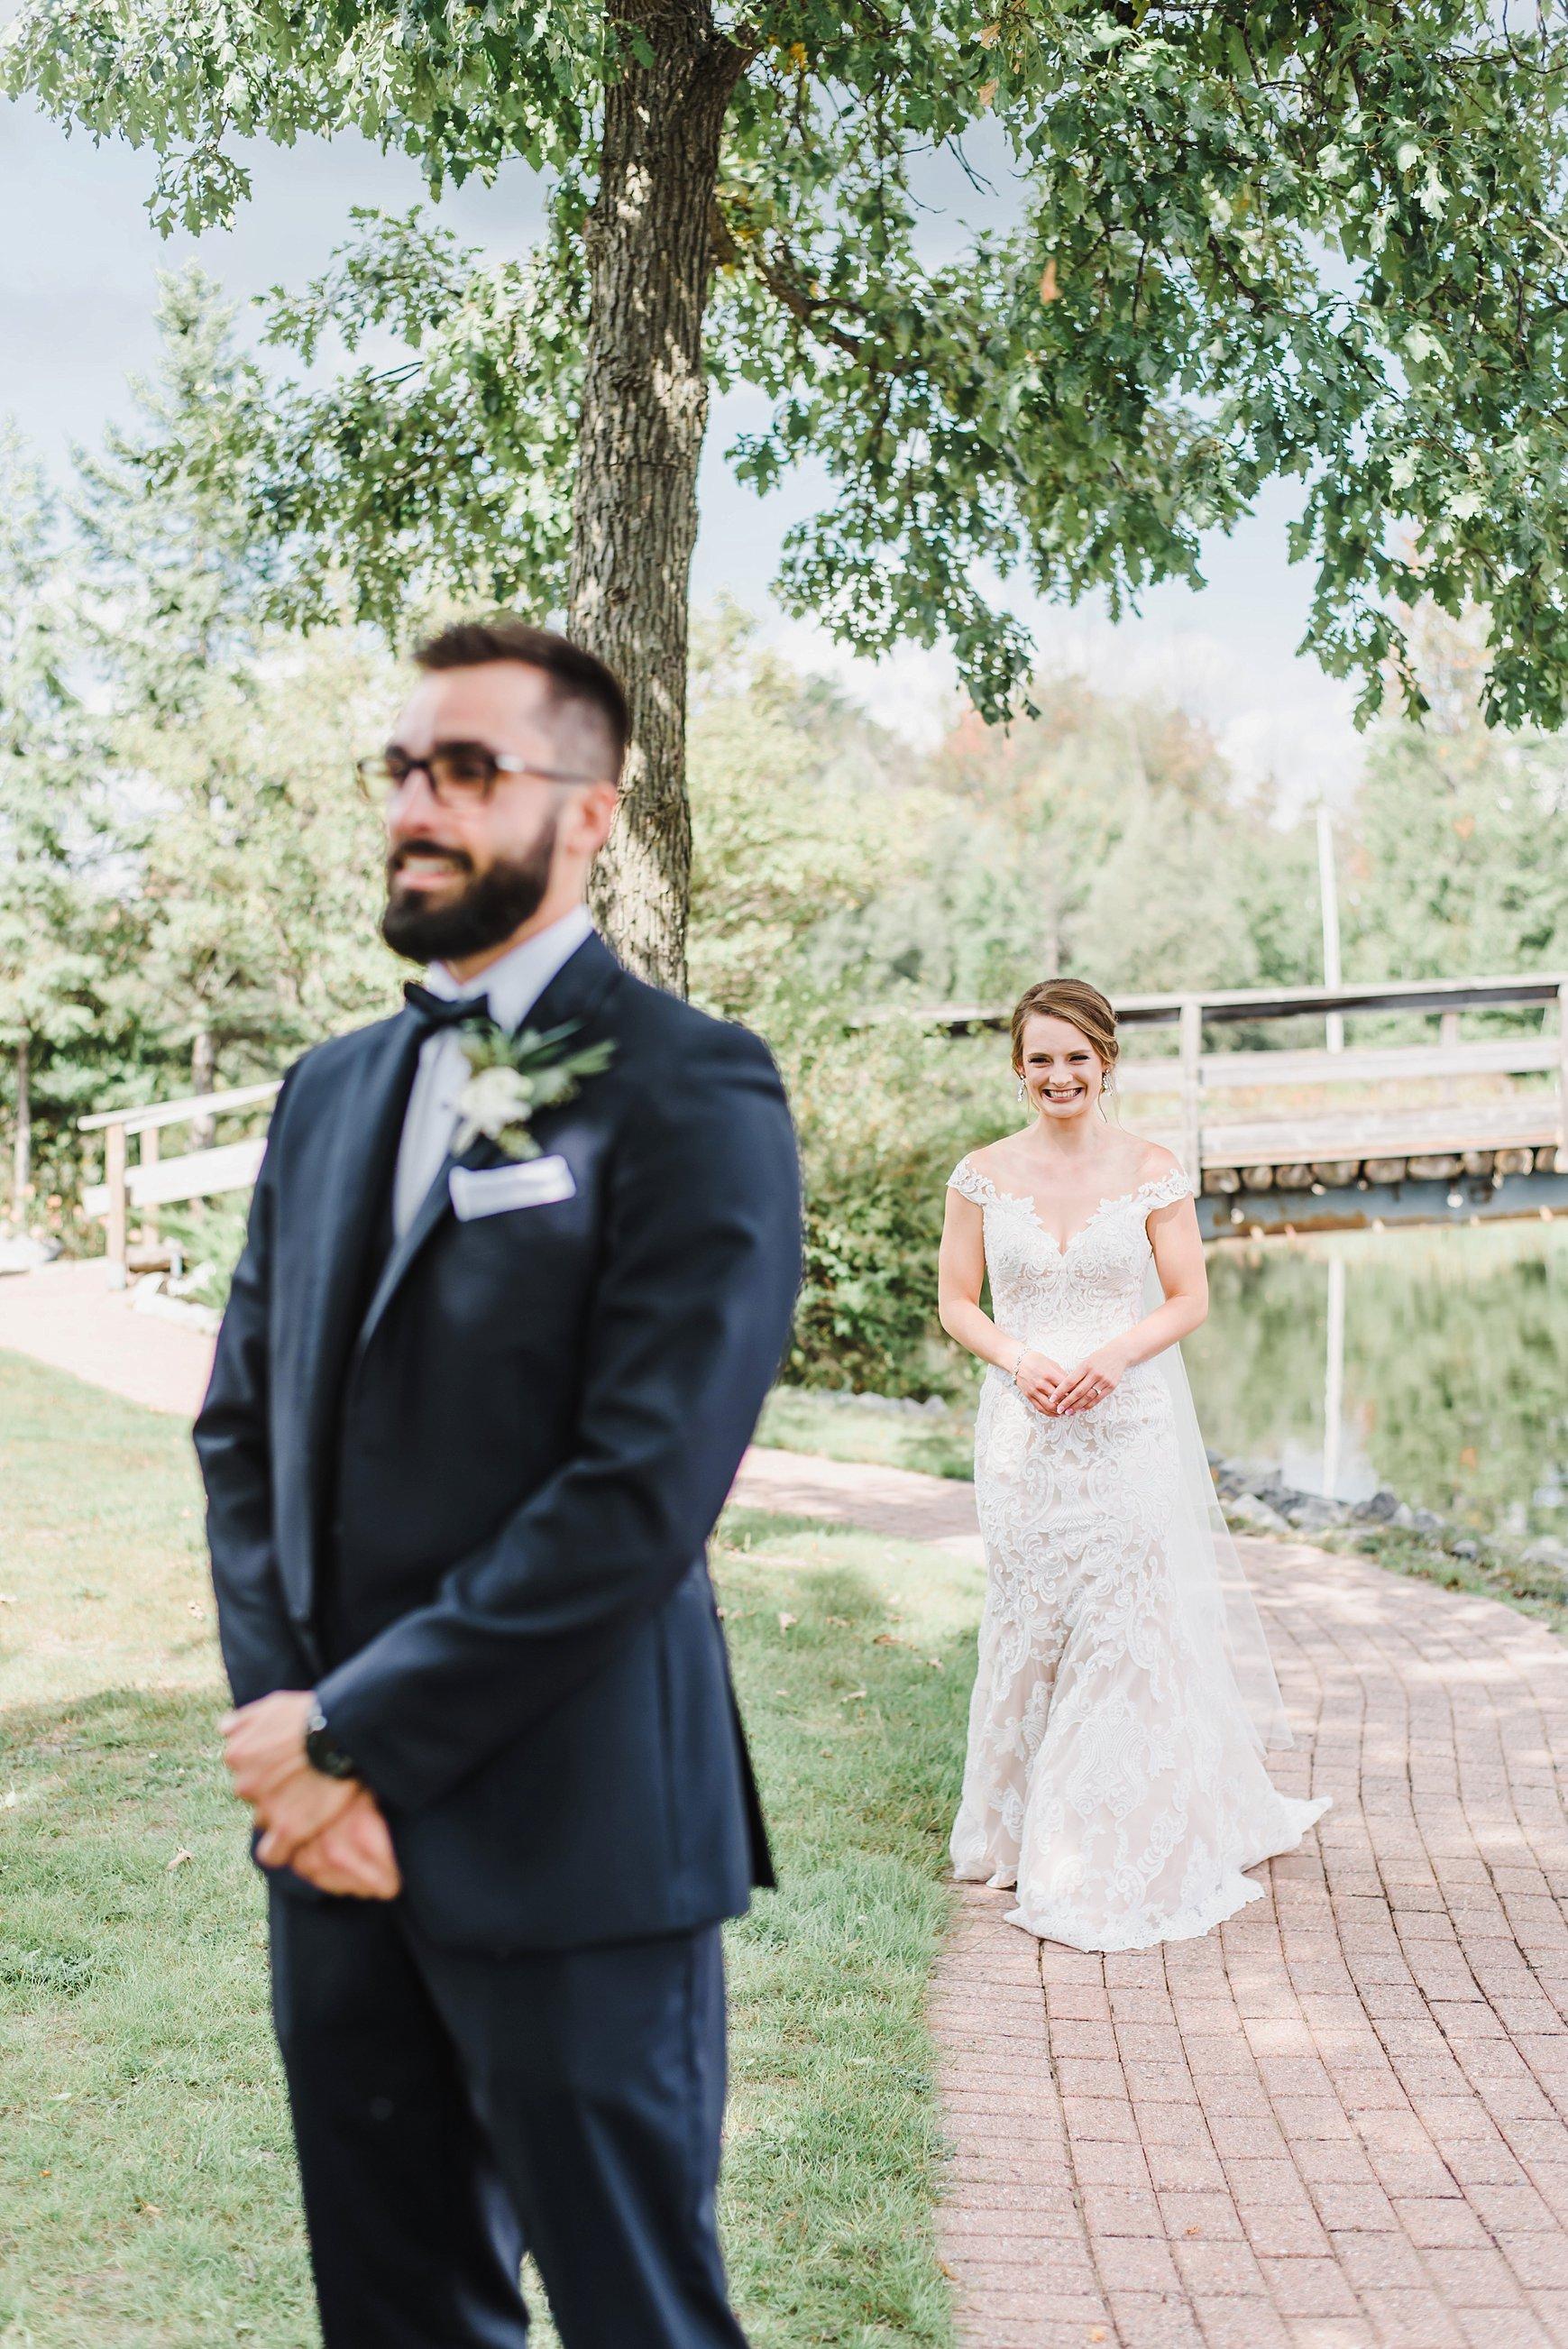 light airy indie fine art ottawa wedding photographer | Ali and Batoul Photography_1239.jpg